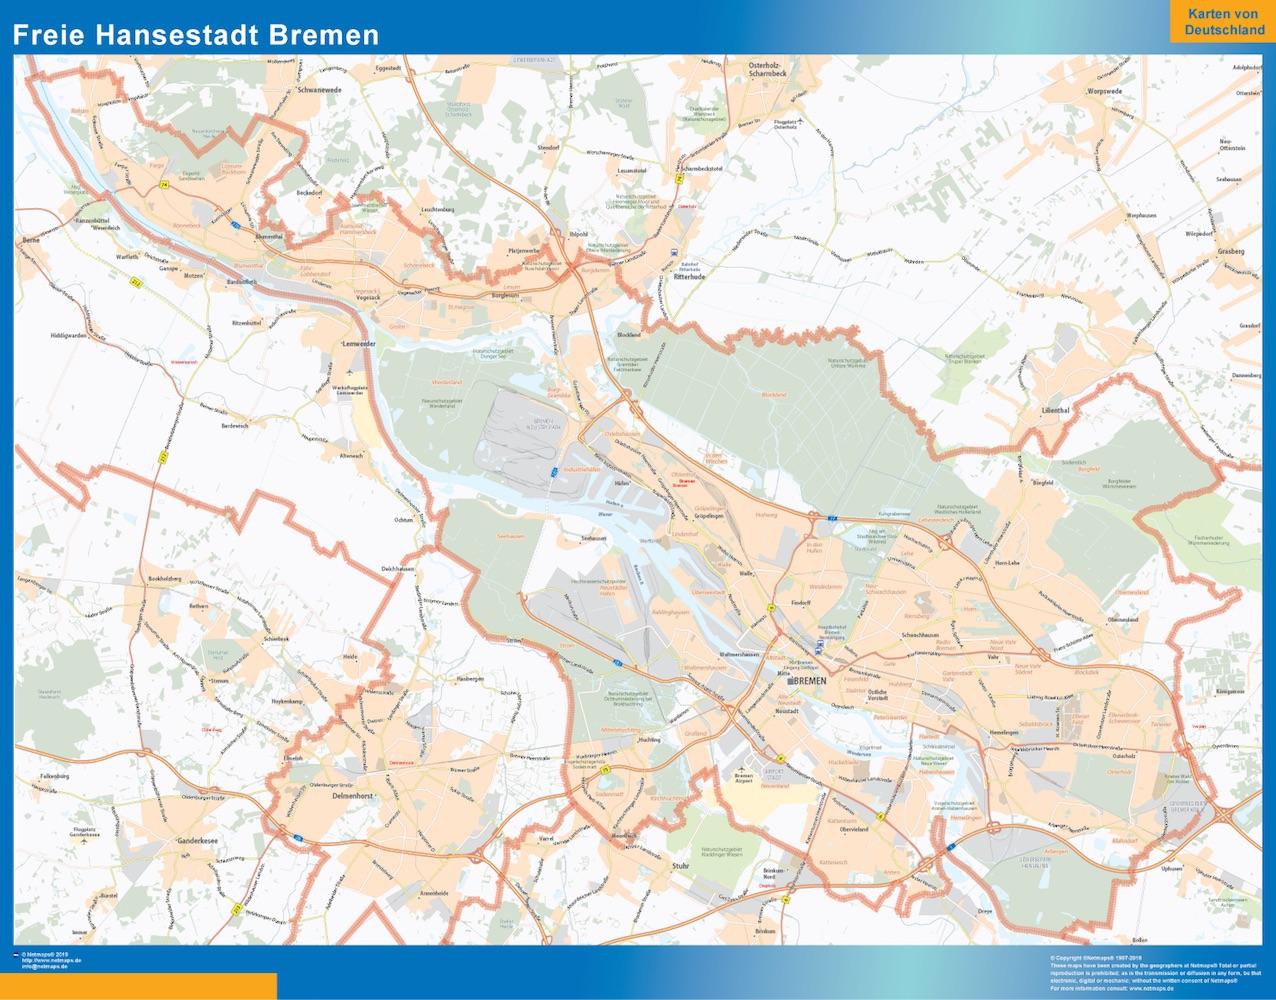 Freie Hansestadt Bremen Wandkarte